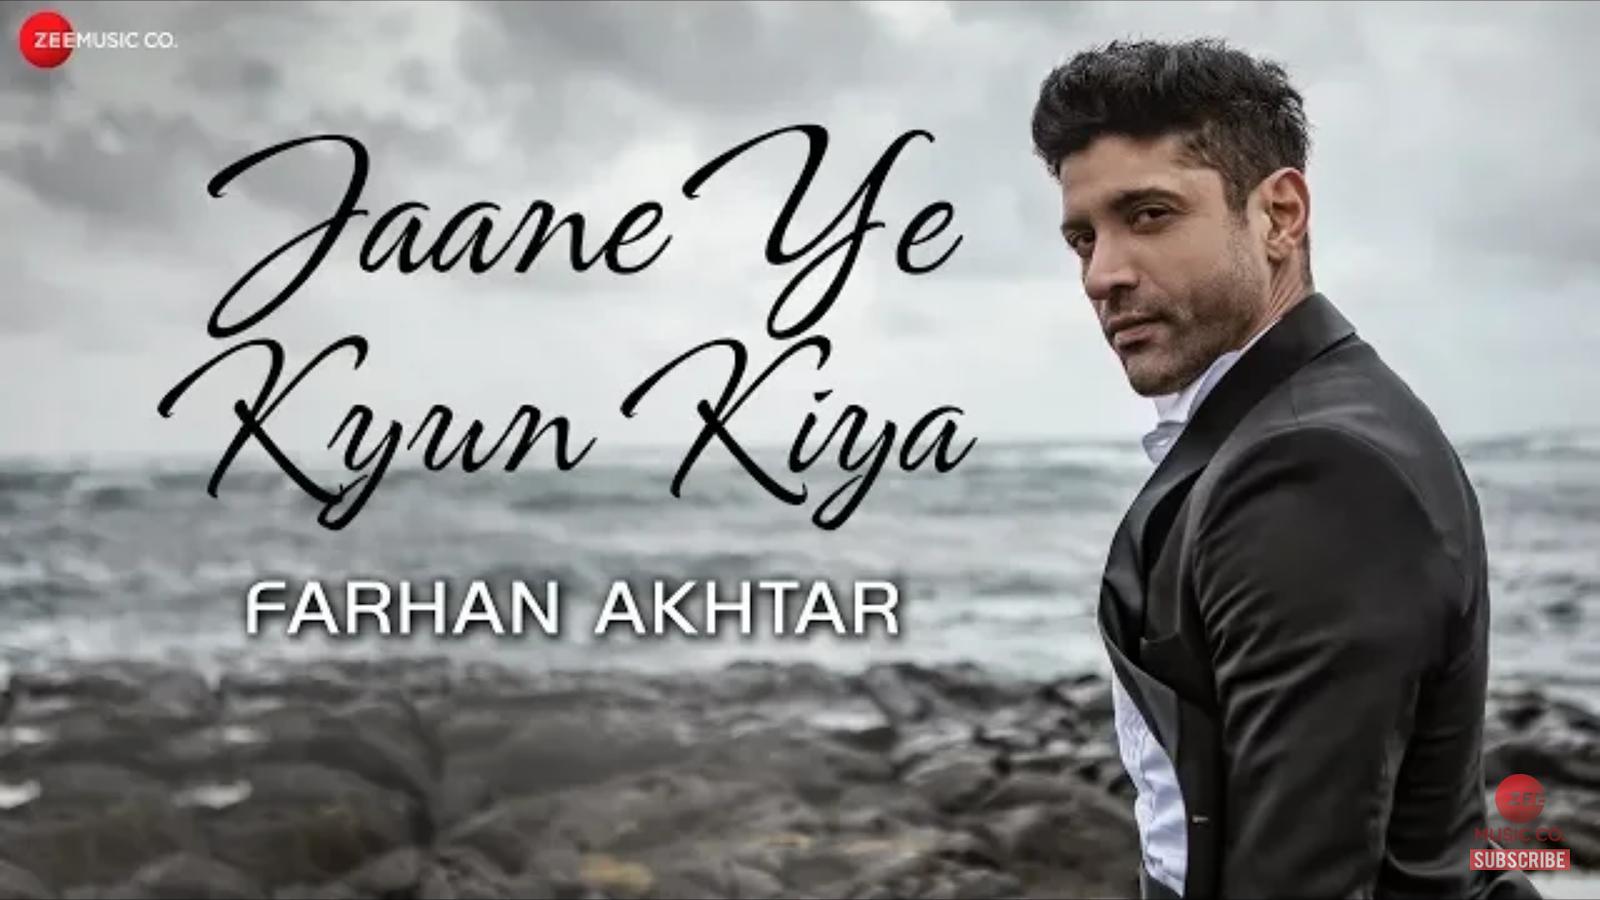 Jaane Ye Kyun Kiya Guitar Chords By Farhan Akhtar Tgtutorials